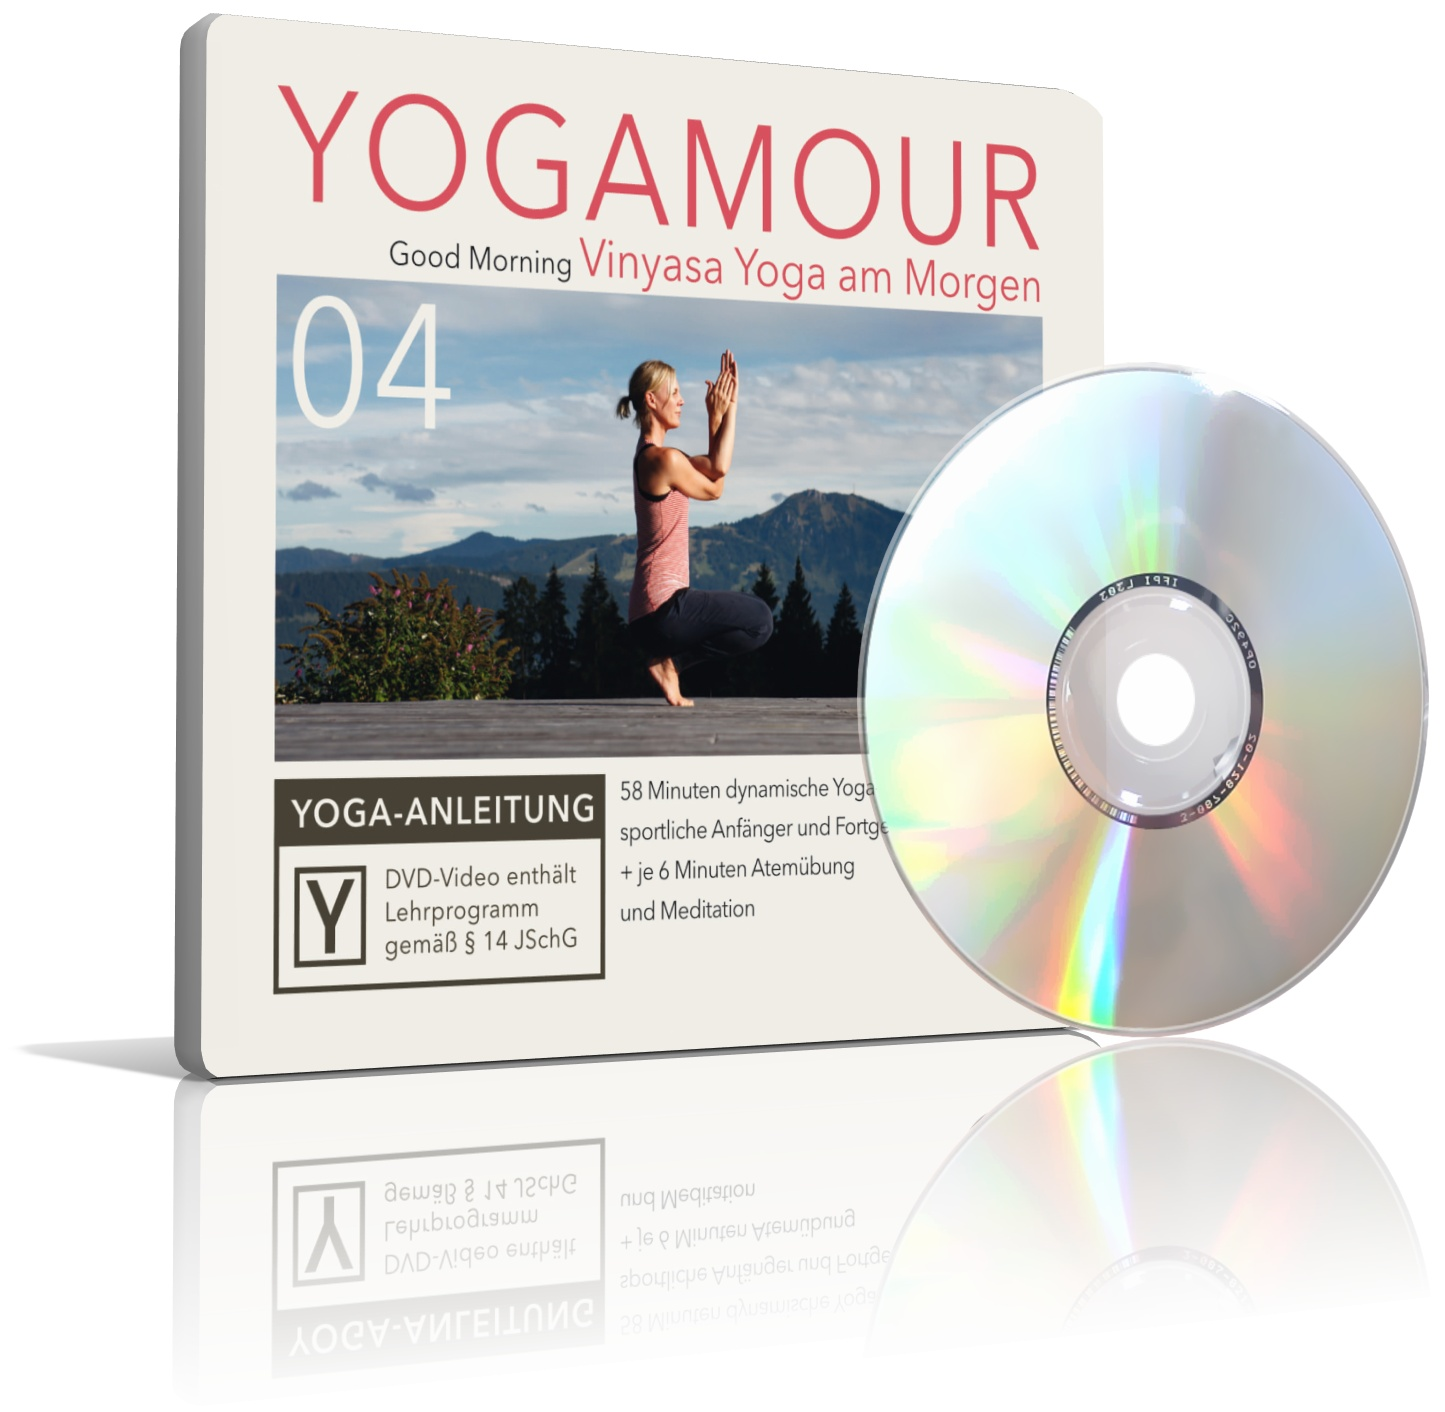 Good Morning - Vinyasa Yoga am Morgen (DVD) von YOGAMOUR